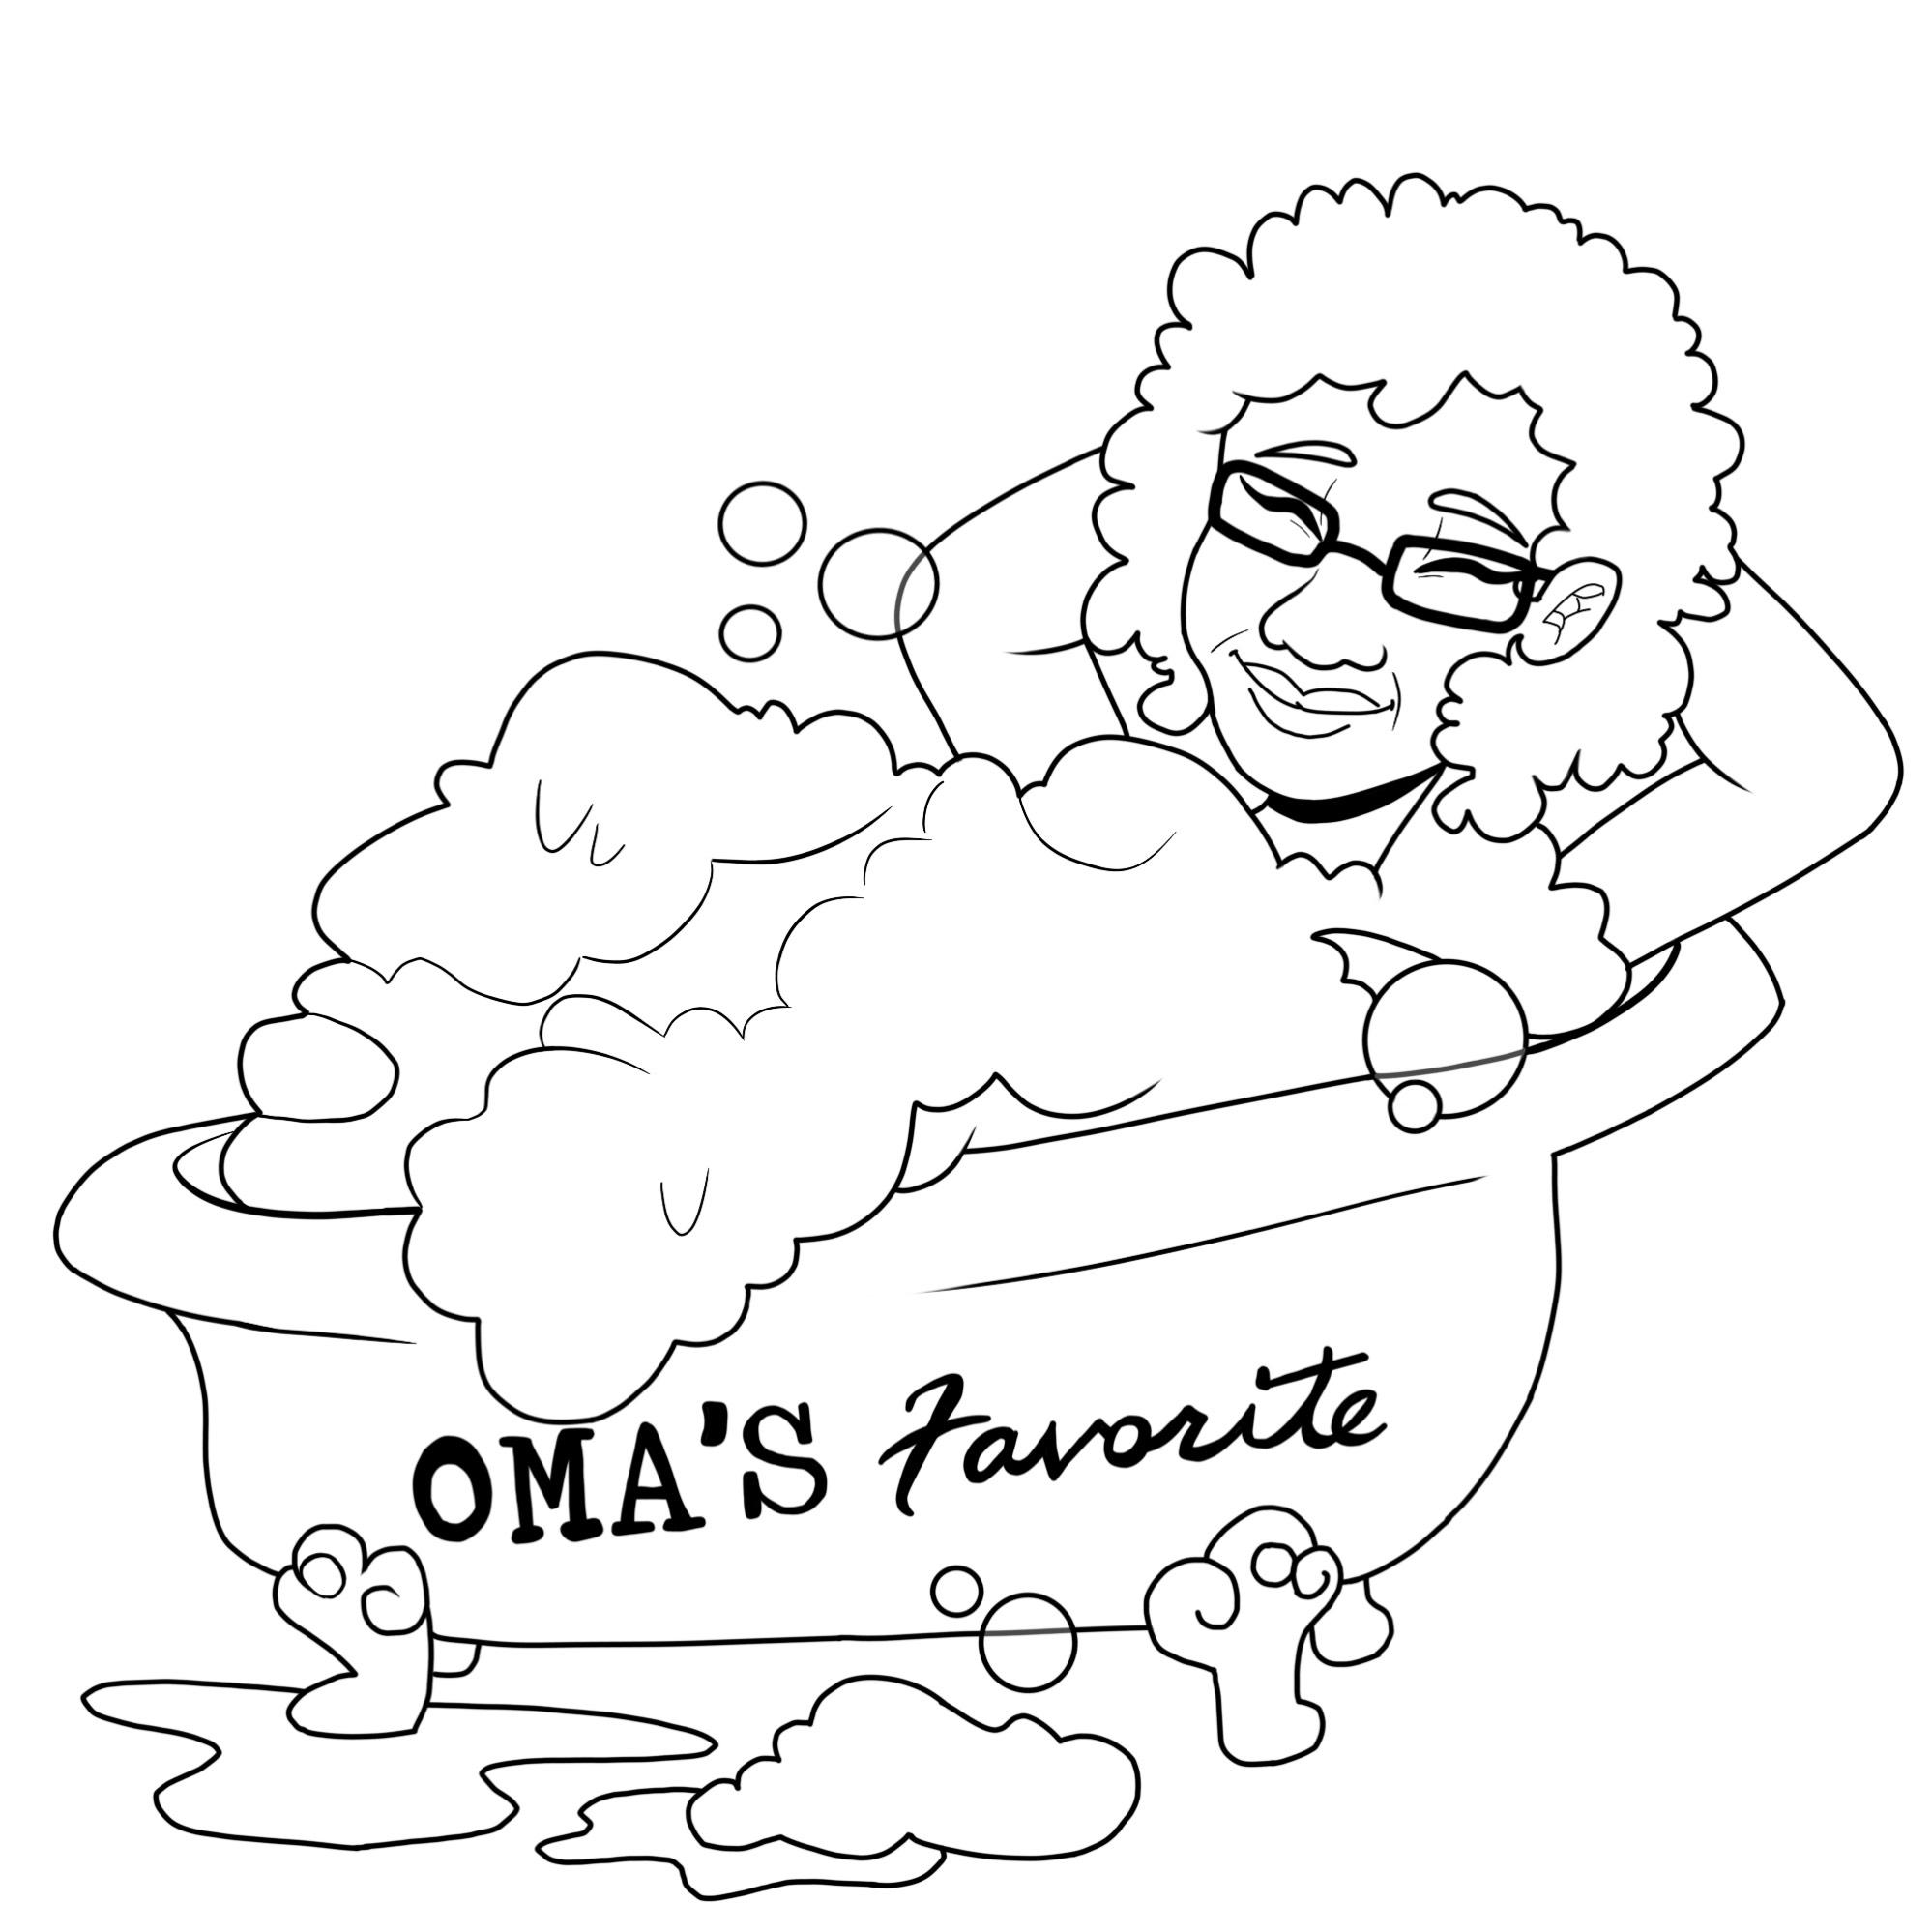 Oma's Favorite Soap Cottage image